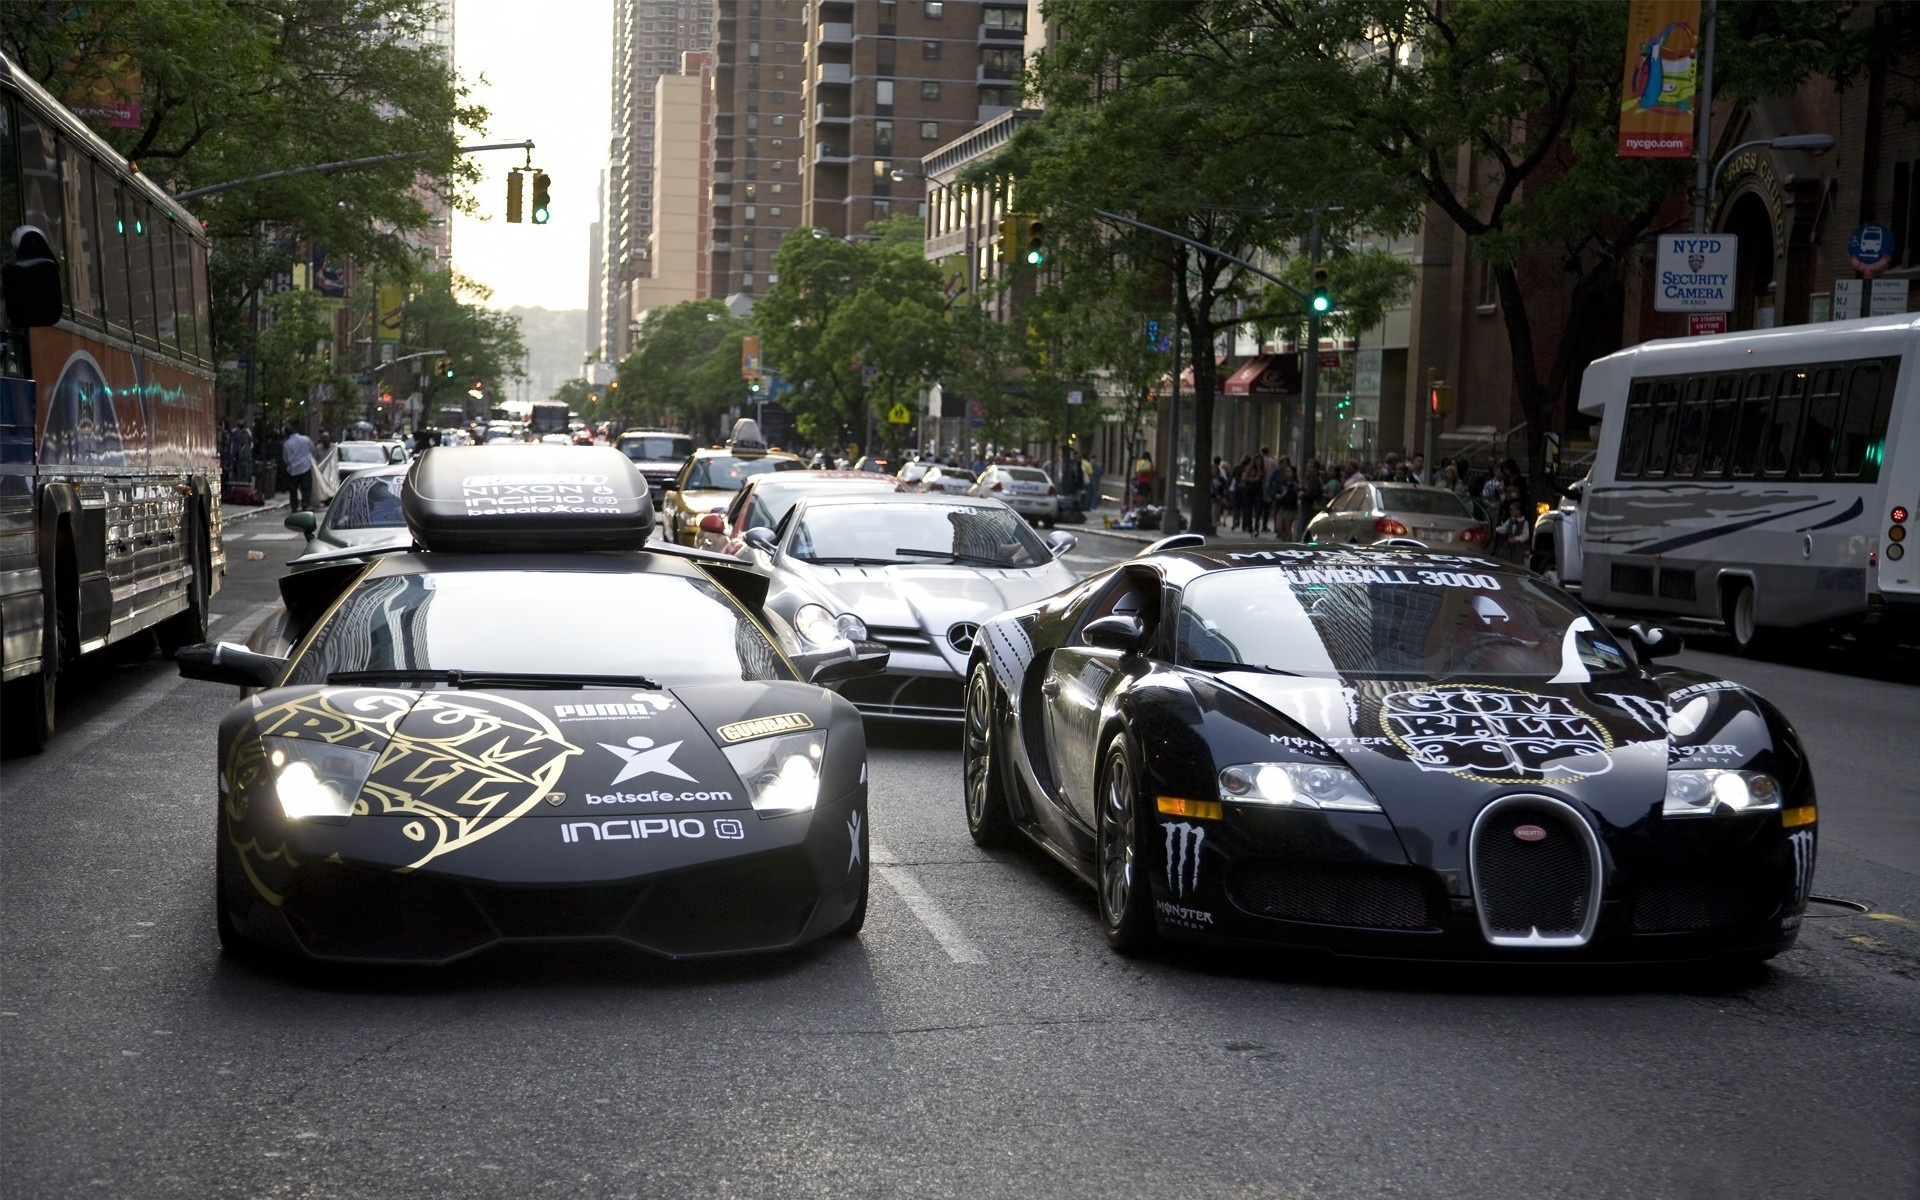 Bugatti Lamborghini Machinery Car Cars Gdefon Original City Wallpaper For Ipad